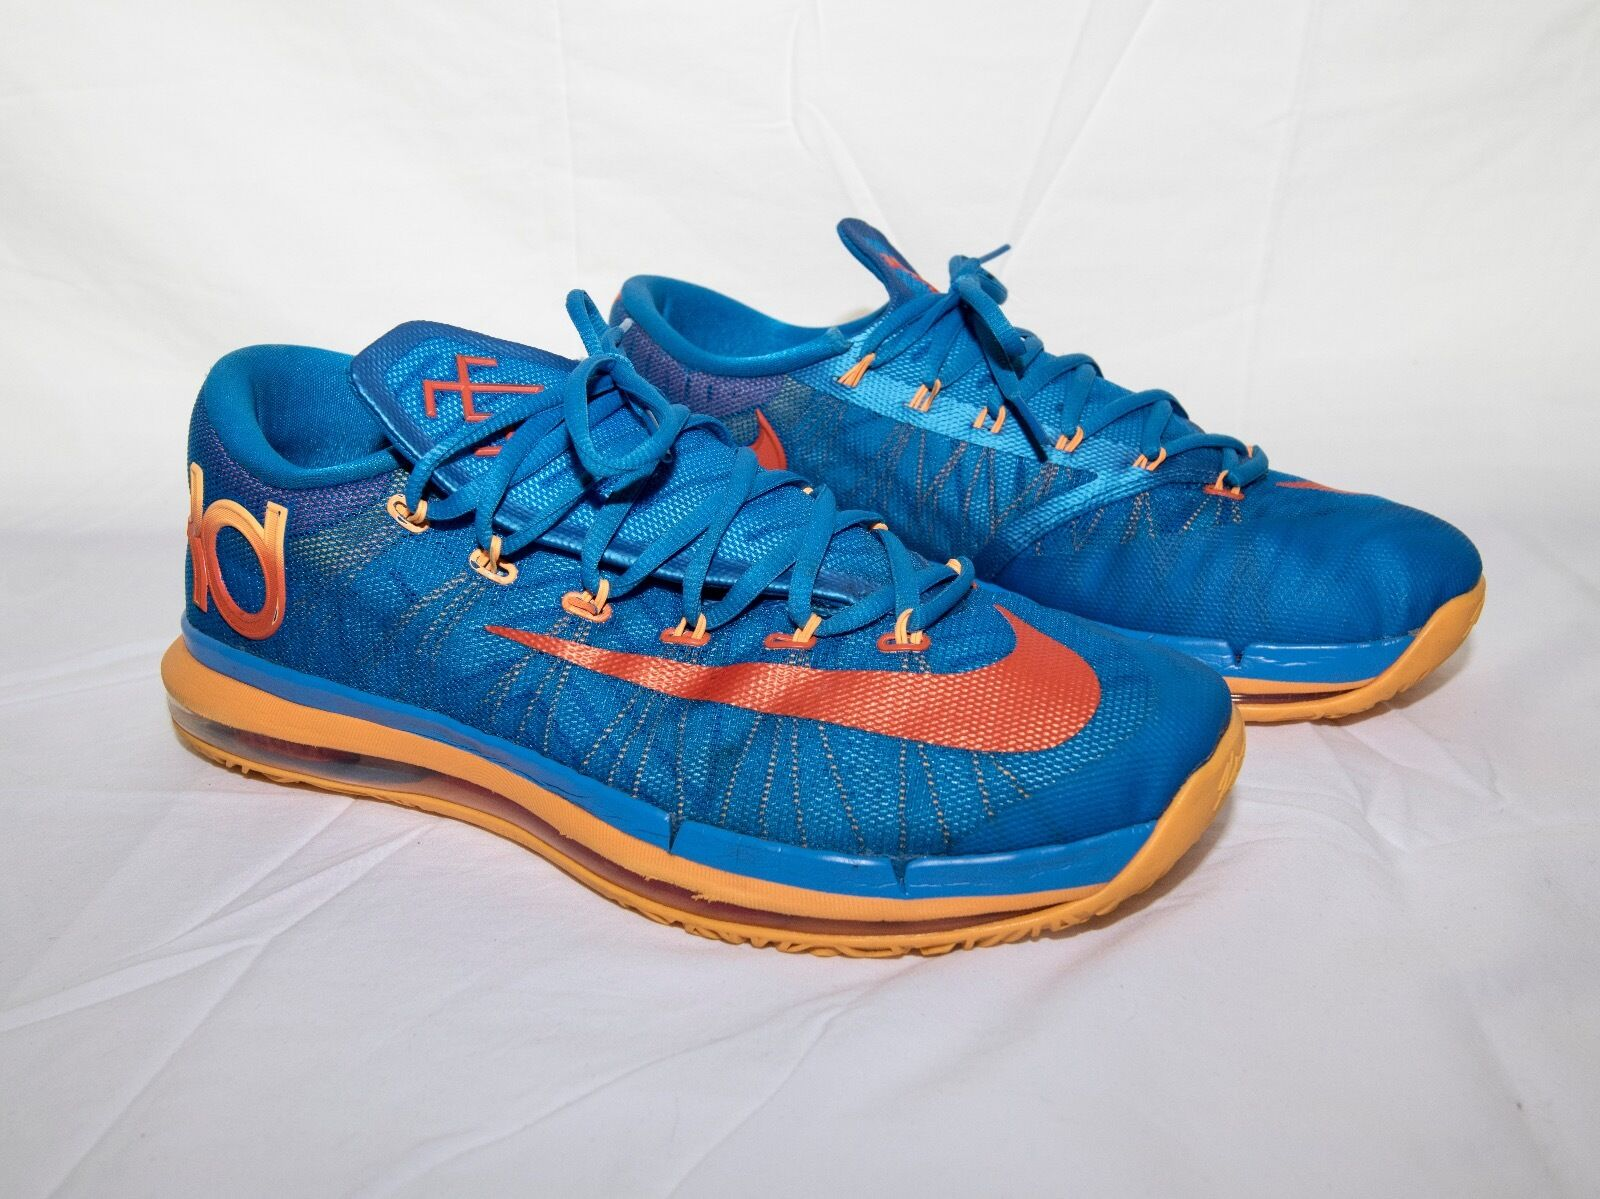 Nike Zoom KD VII 7 Elite Photo Blue/Atomic Orange-Vivid Blue-Orange Size 11.5